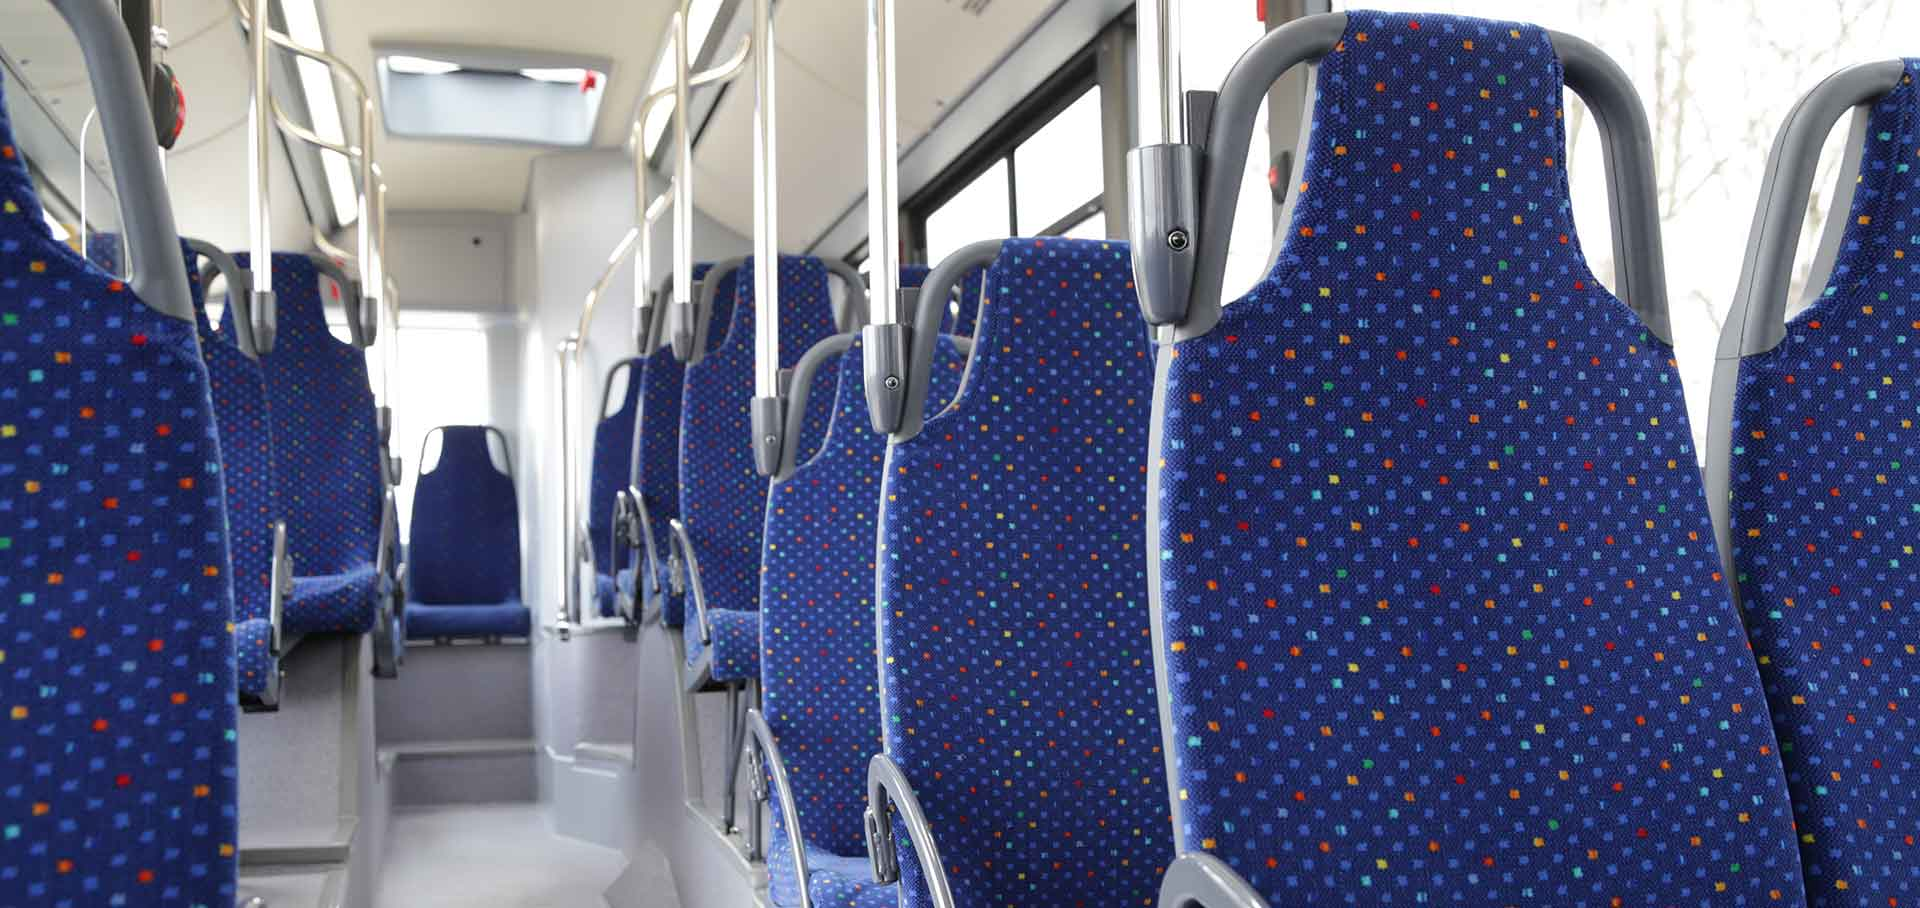 https://www.industriaitalianaautobus.com/wp-content/uploads/2021/04/bg-citymood-12-LNG-classe-ll.jpg